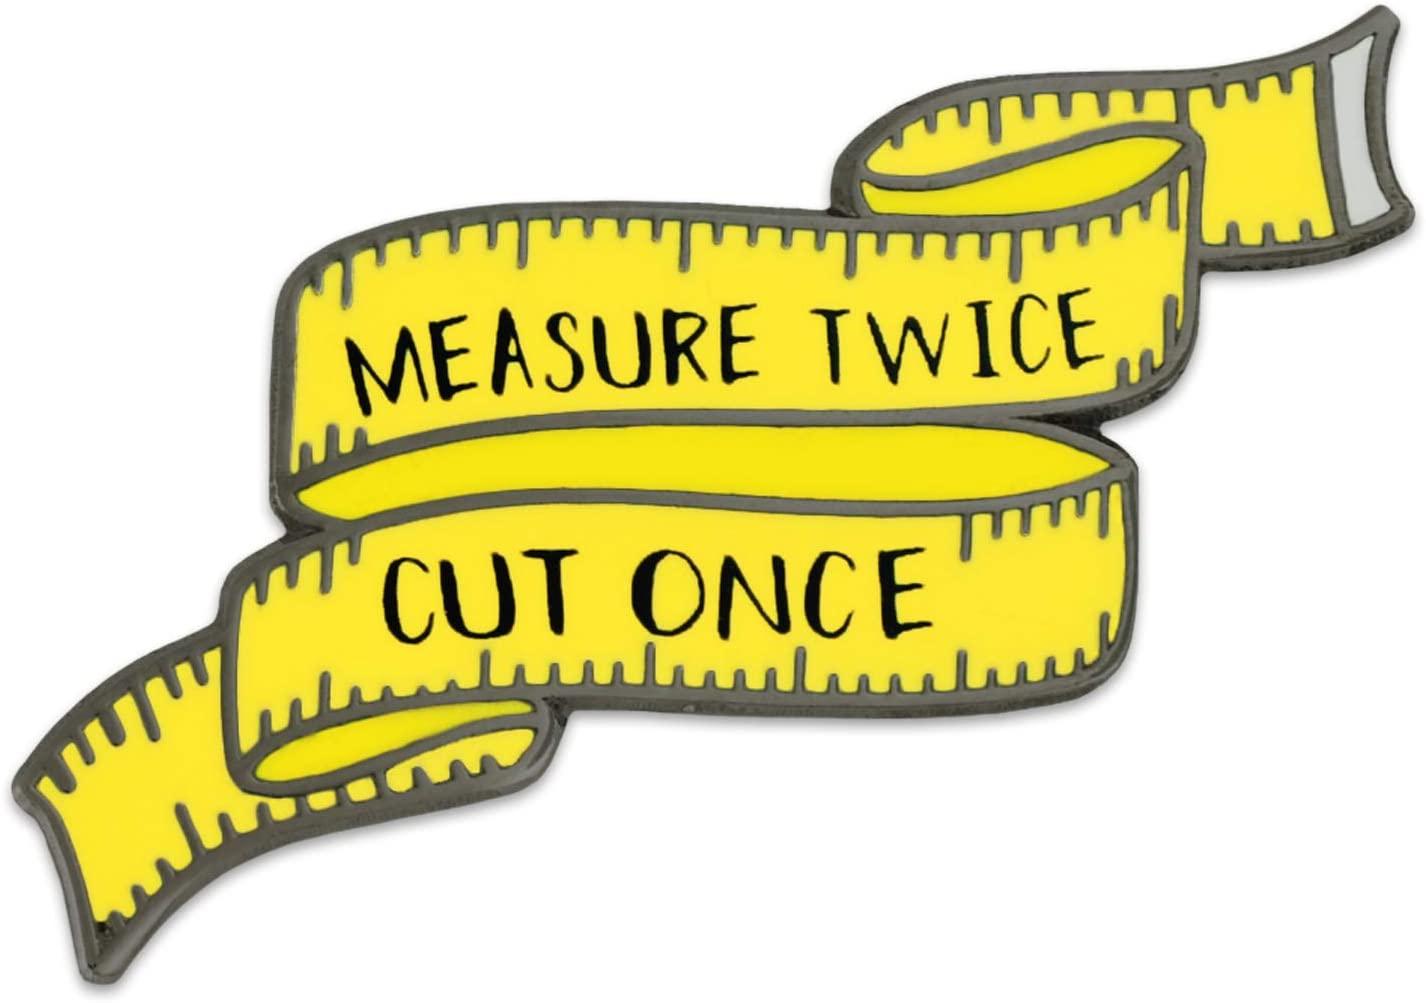 PinMart's Sewing Tape Measure Cute Enamel Magnetic Lapel Pin and Needle Minder